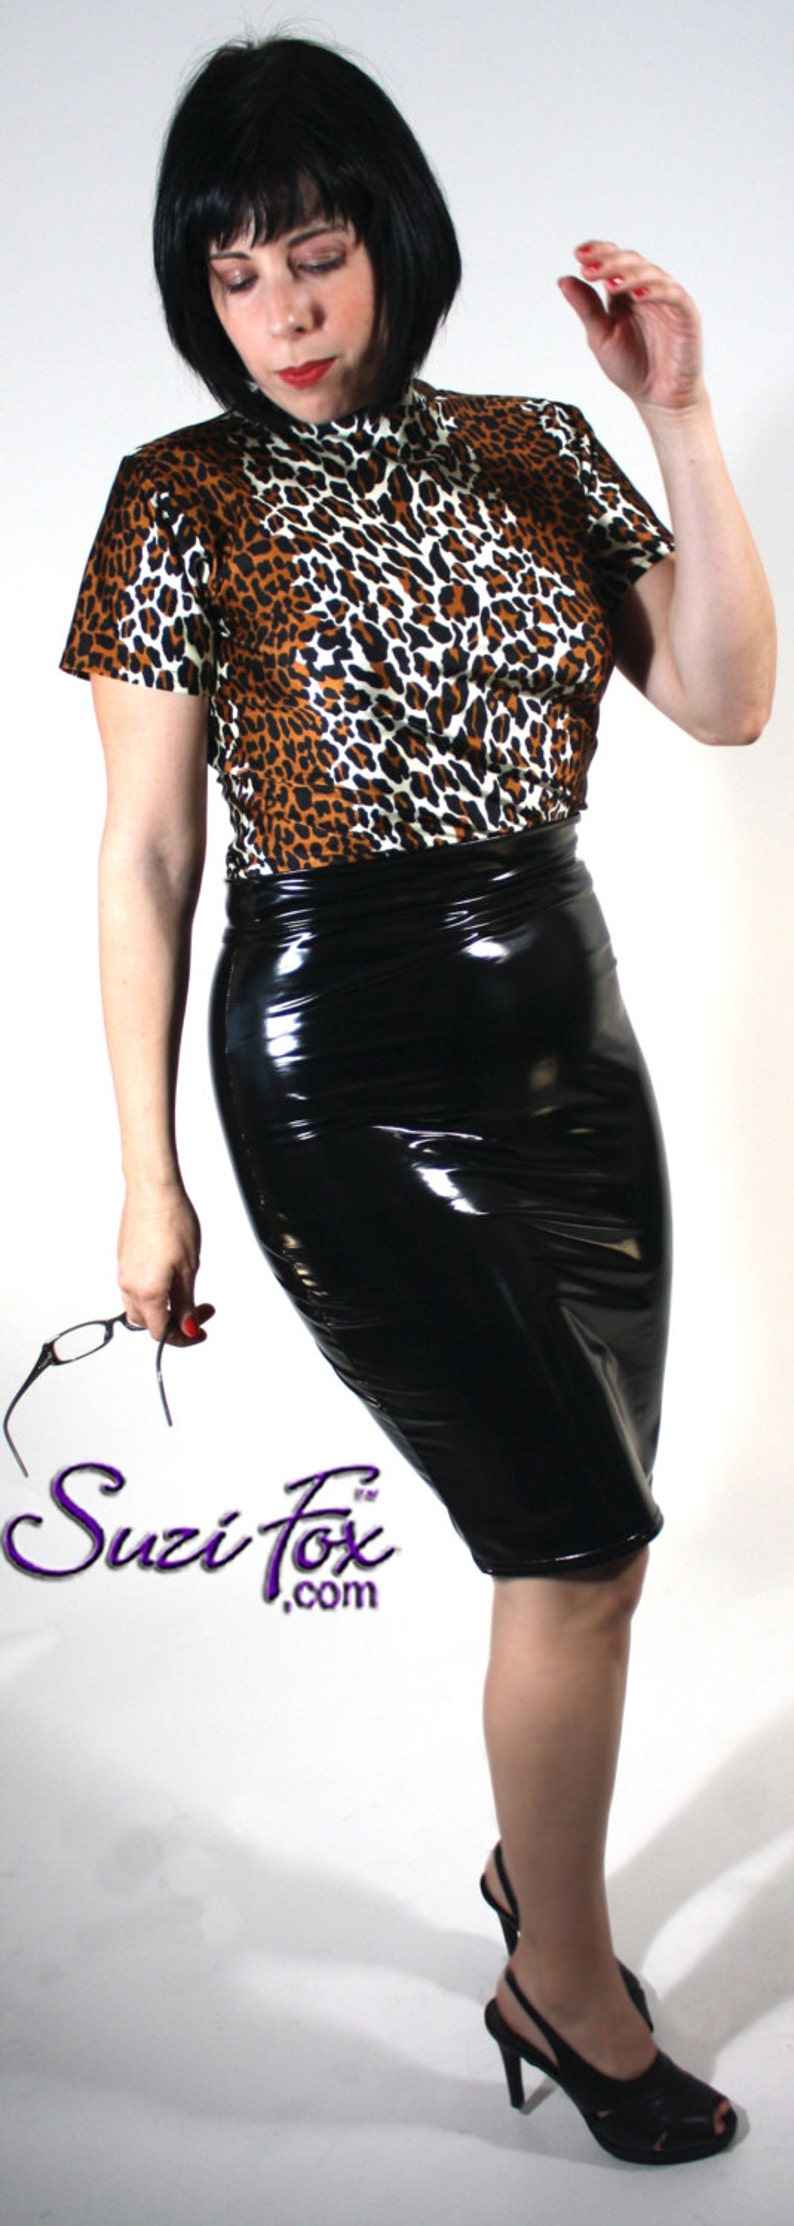 d31d94d0f Pencil Skirt in Gloss Stretch PVC Vinyl by Suzi Fox   Etsy